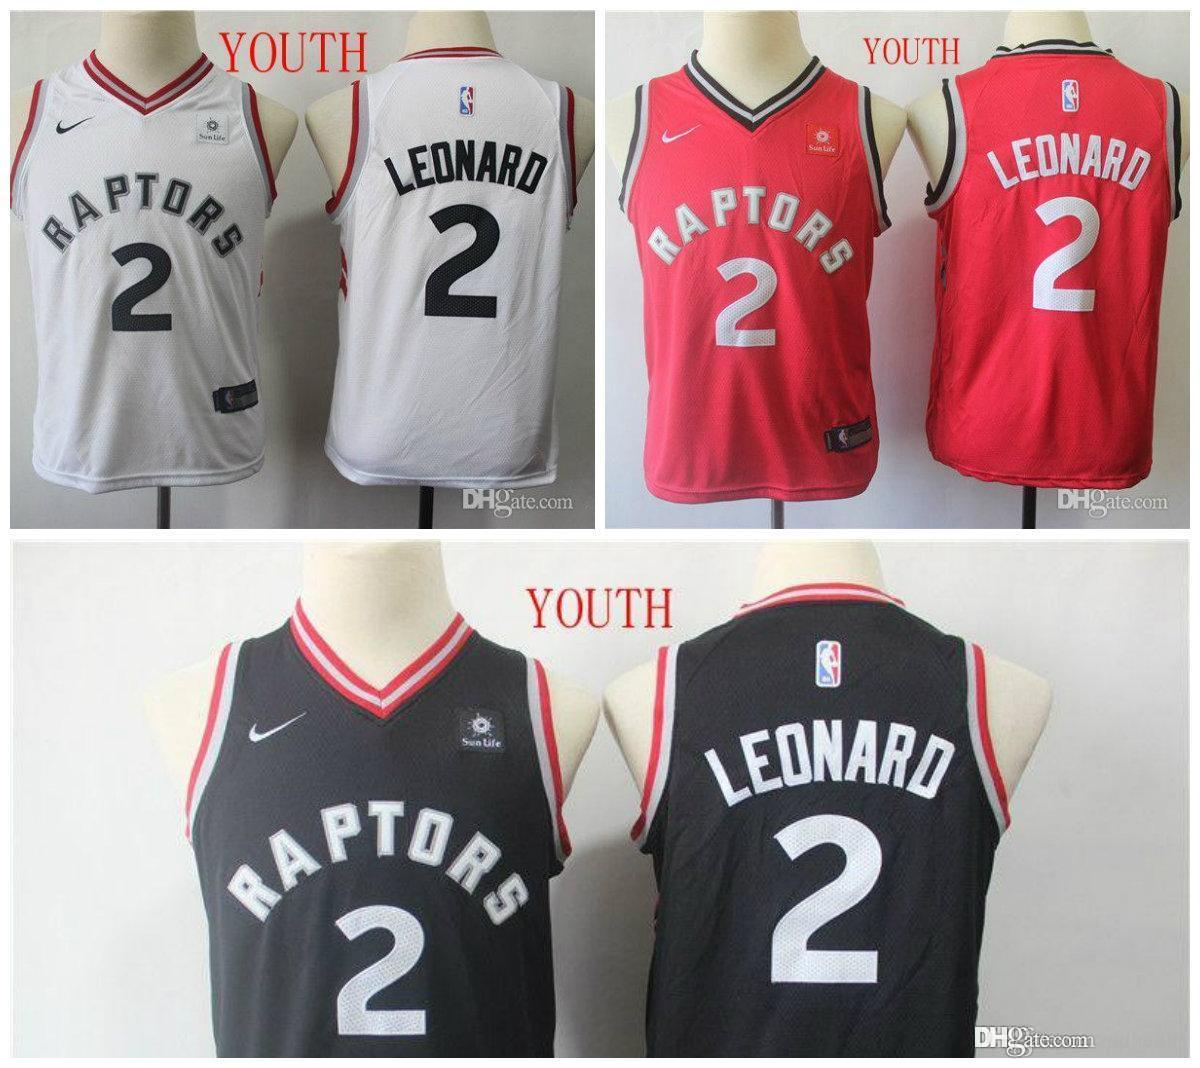 huge discount d67f8 5c98c TOP High QualityYouth Toronto Kawhi Raptors 2 Leonard Fanatics Branded Red  Fast Break Replica Jersey - Icon Edition Retro Embroidery jersey,